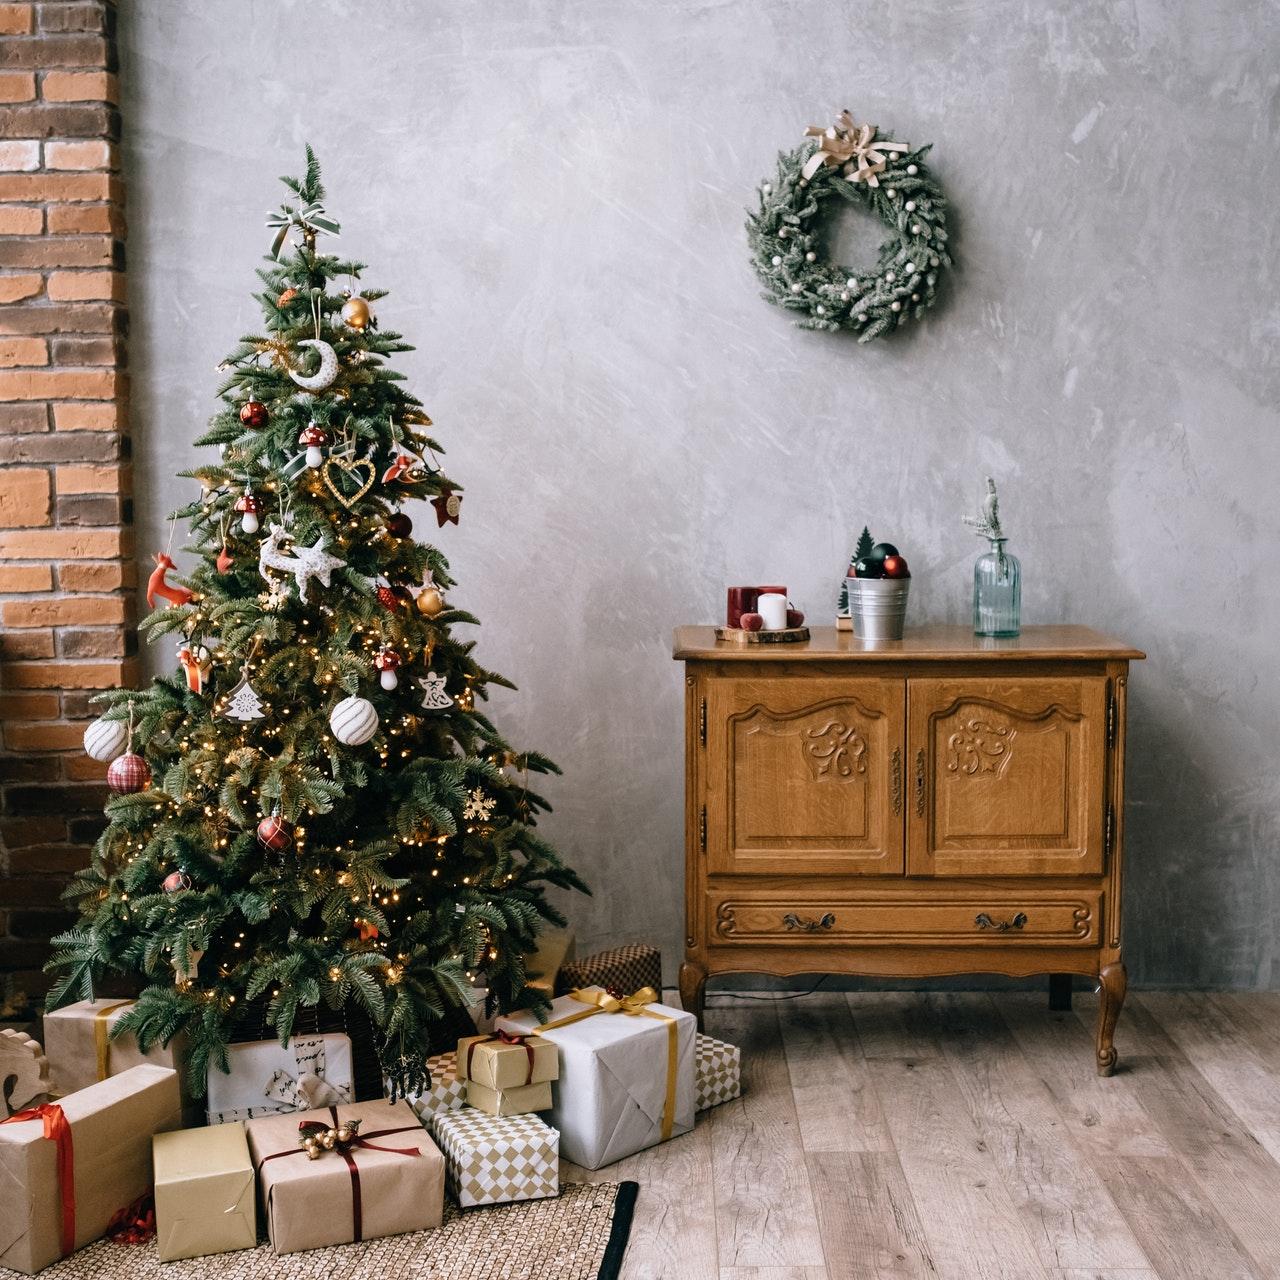 idee per regali di Natale per la casa